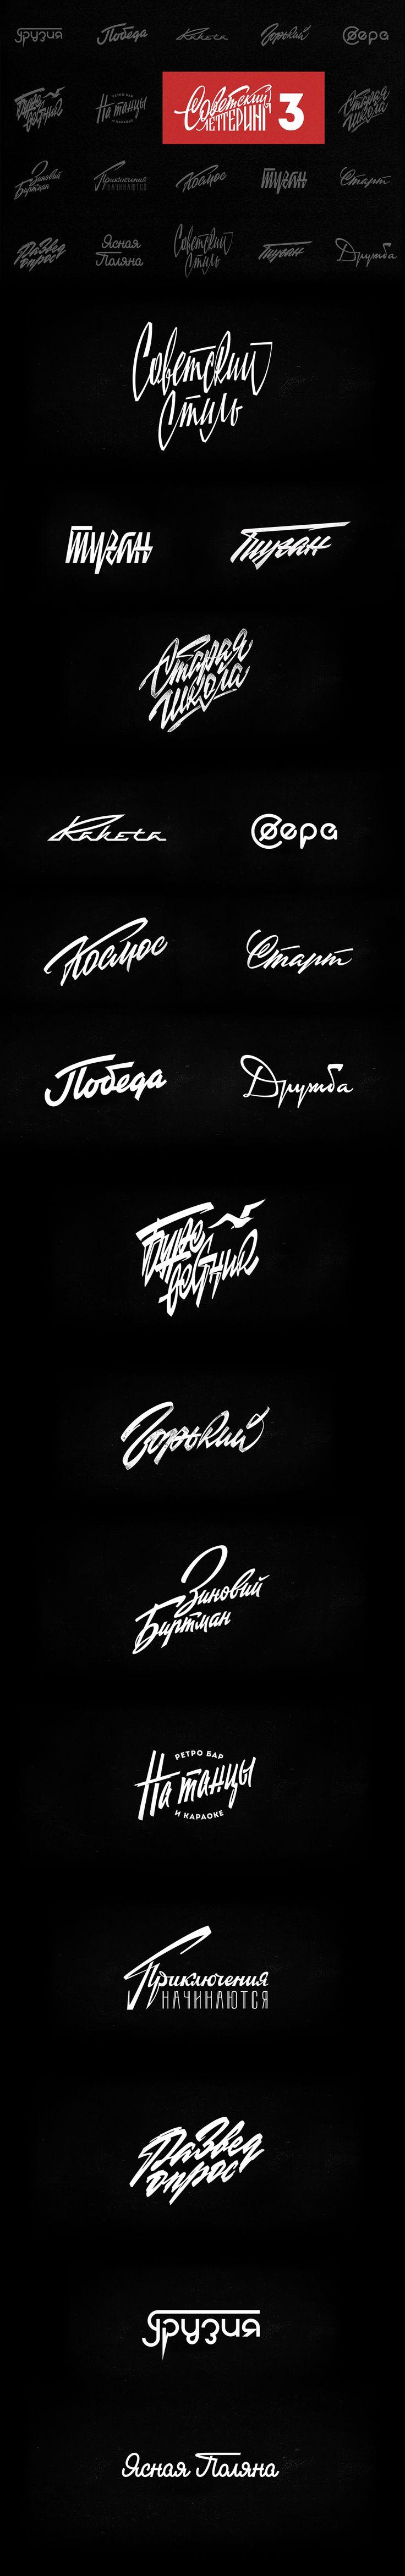 Ретро советский леттеринг. ч.3, Шрифт © Александр Шиманов